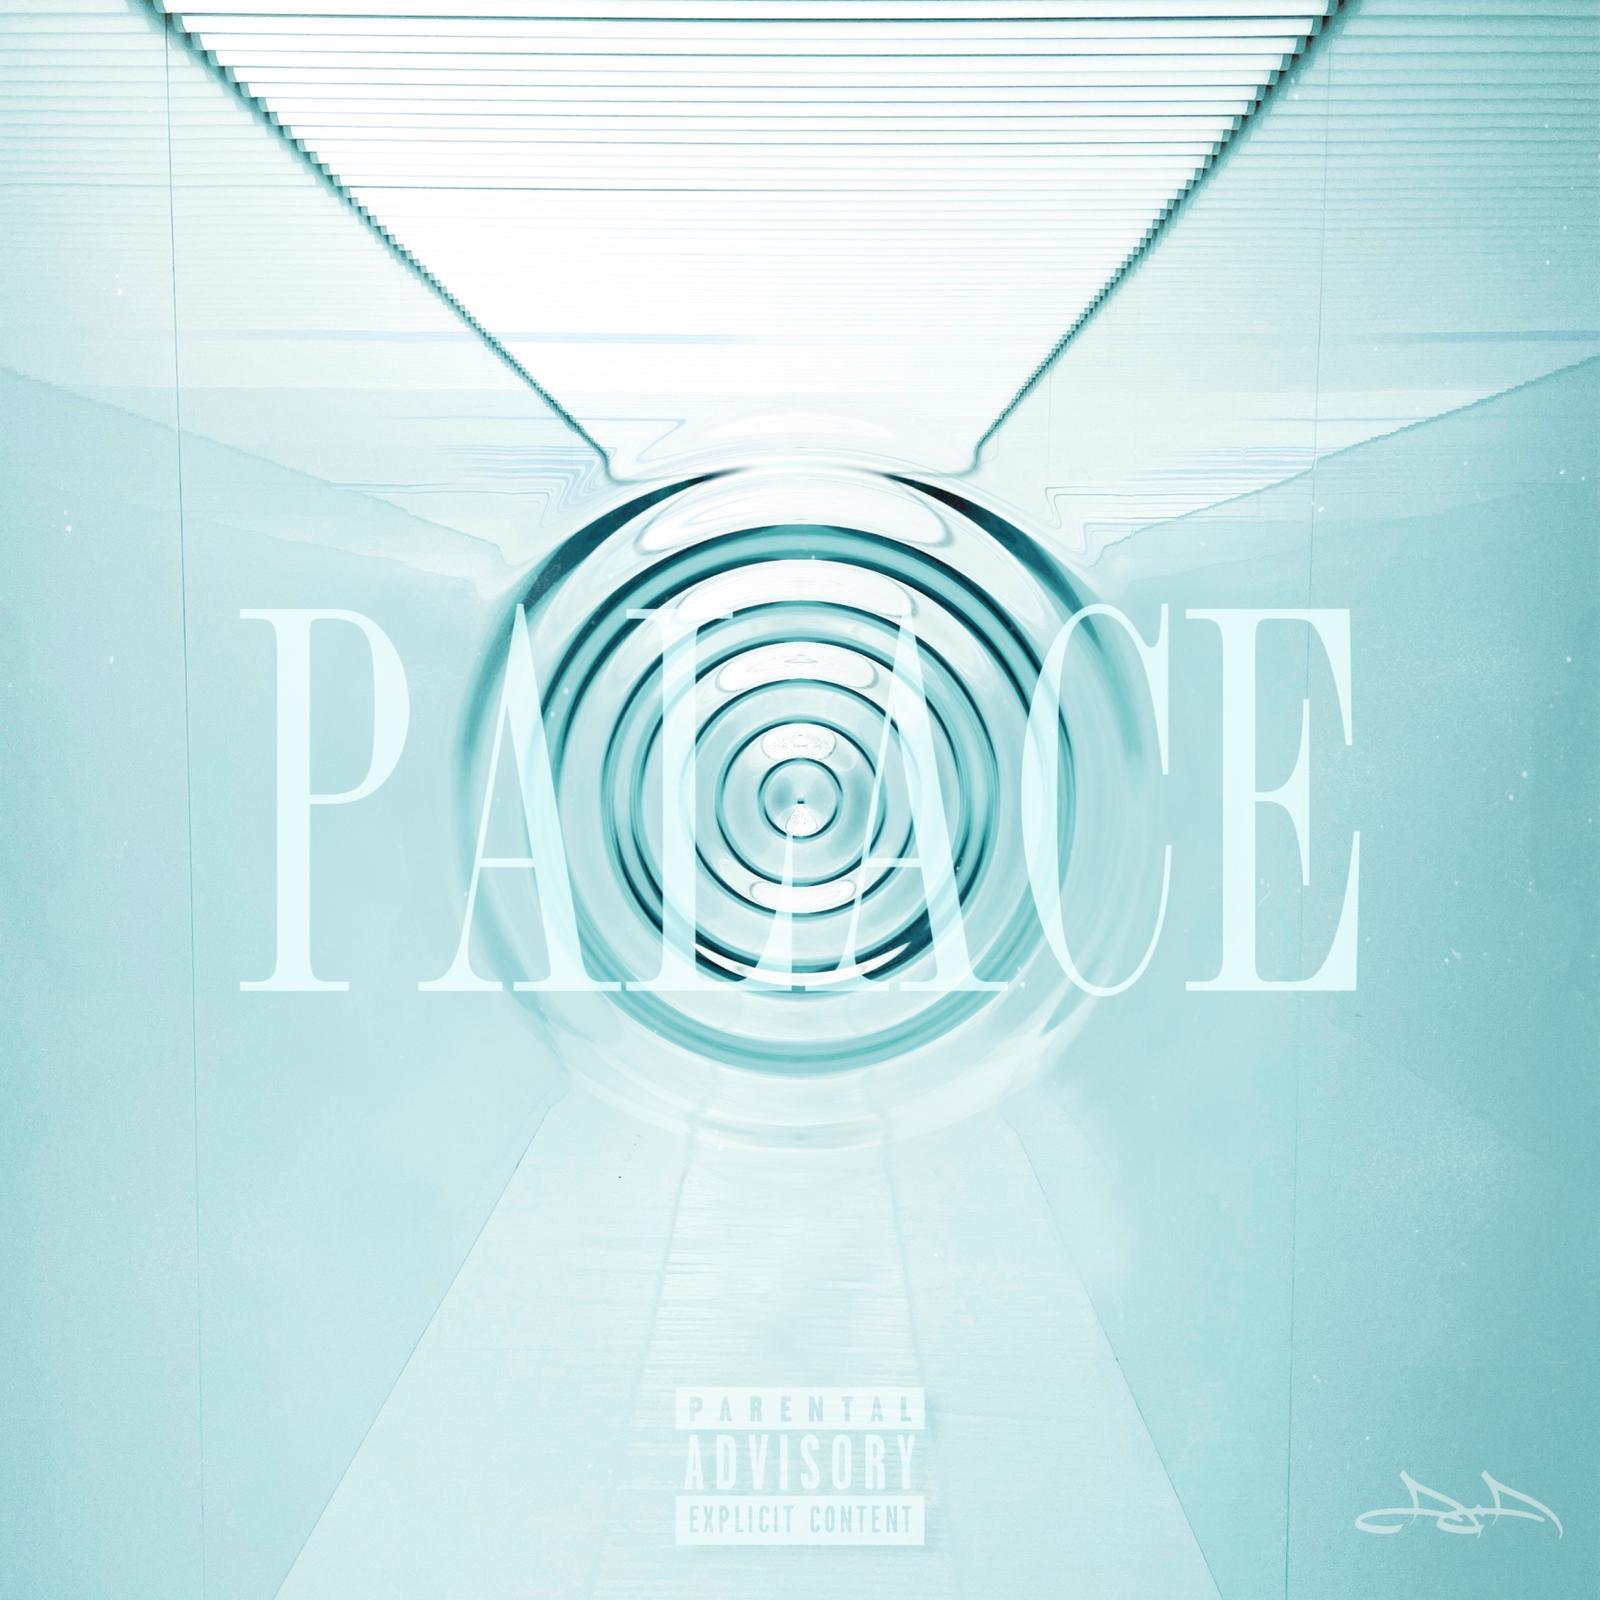 Upcoming: XALPOO - Palace